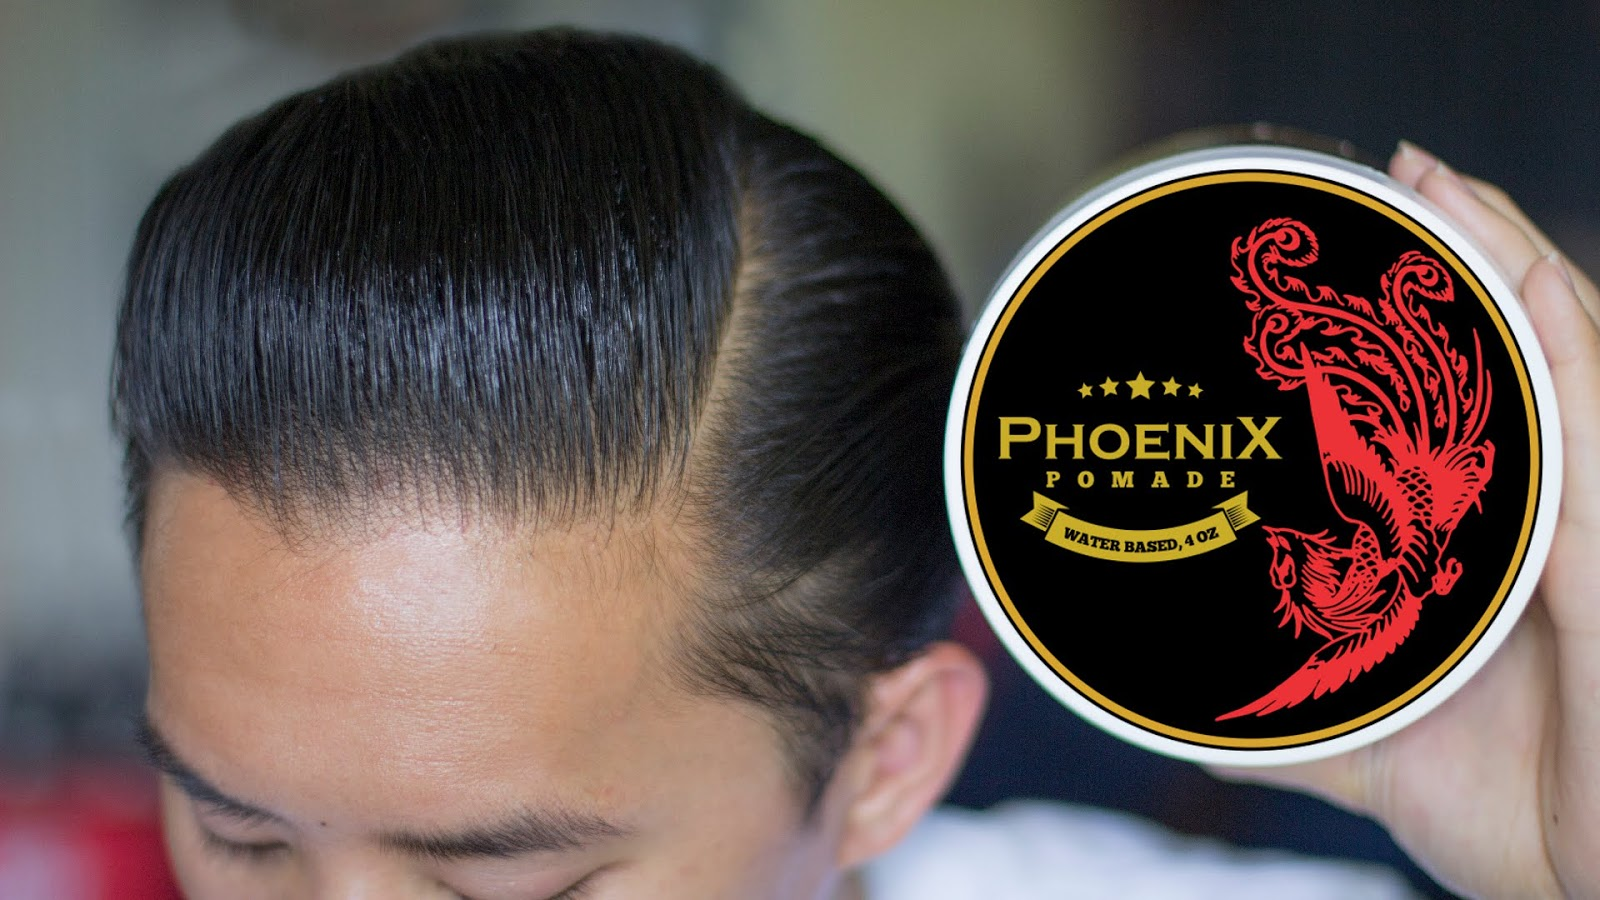 PhoenixPomade.com